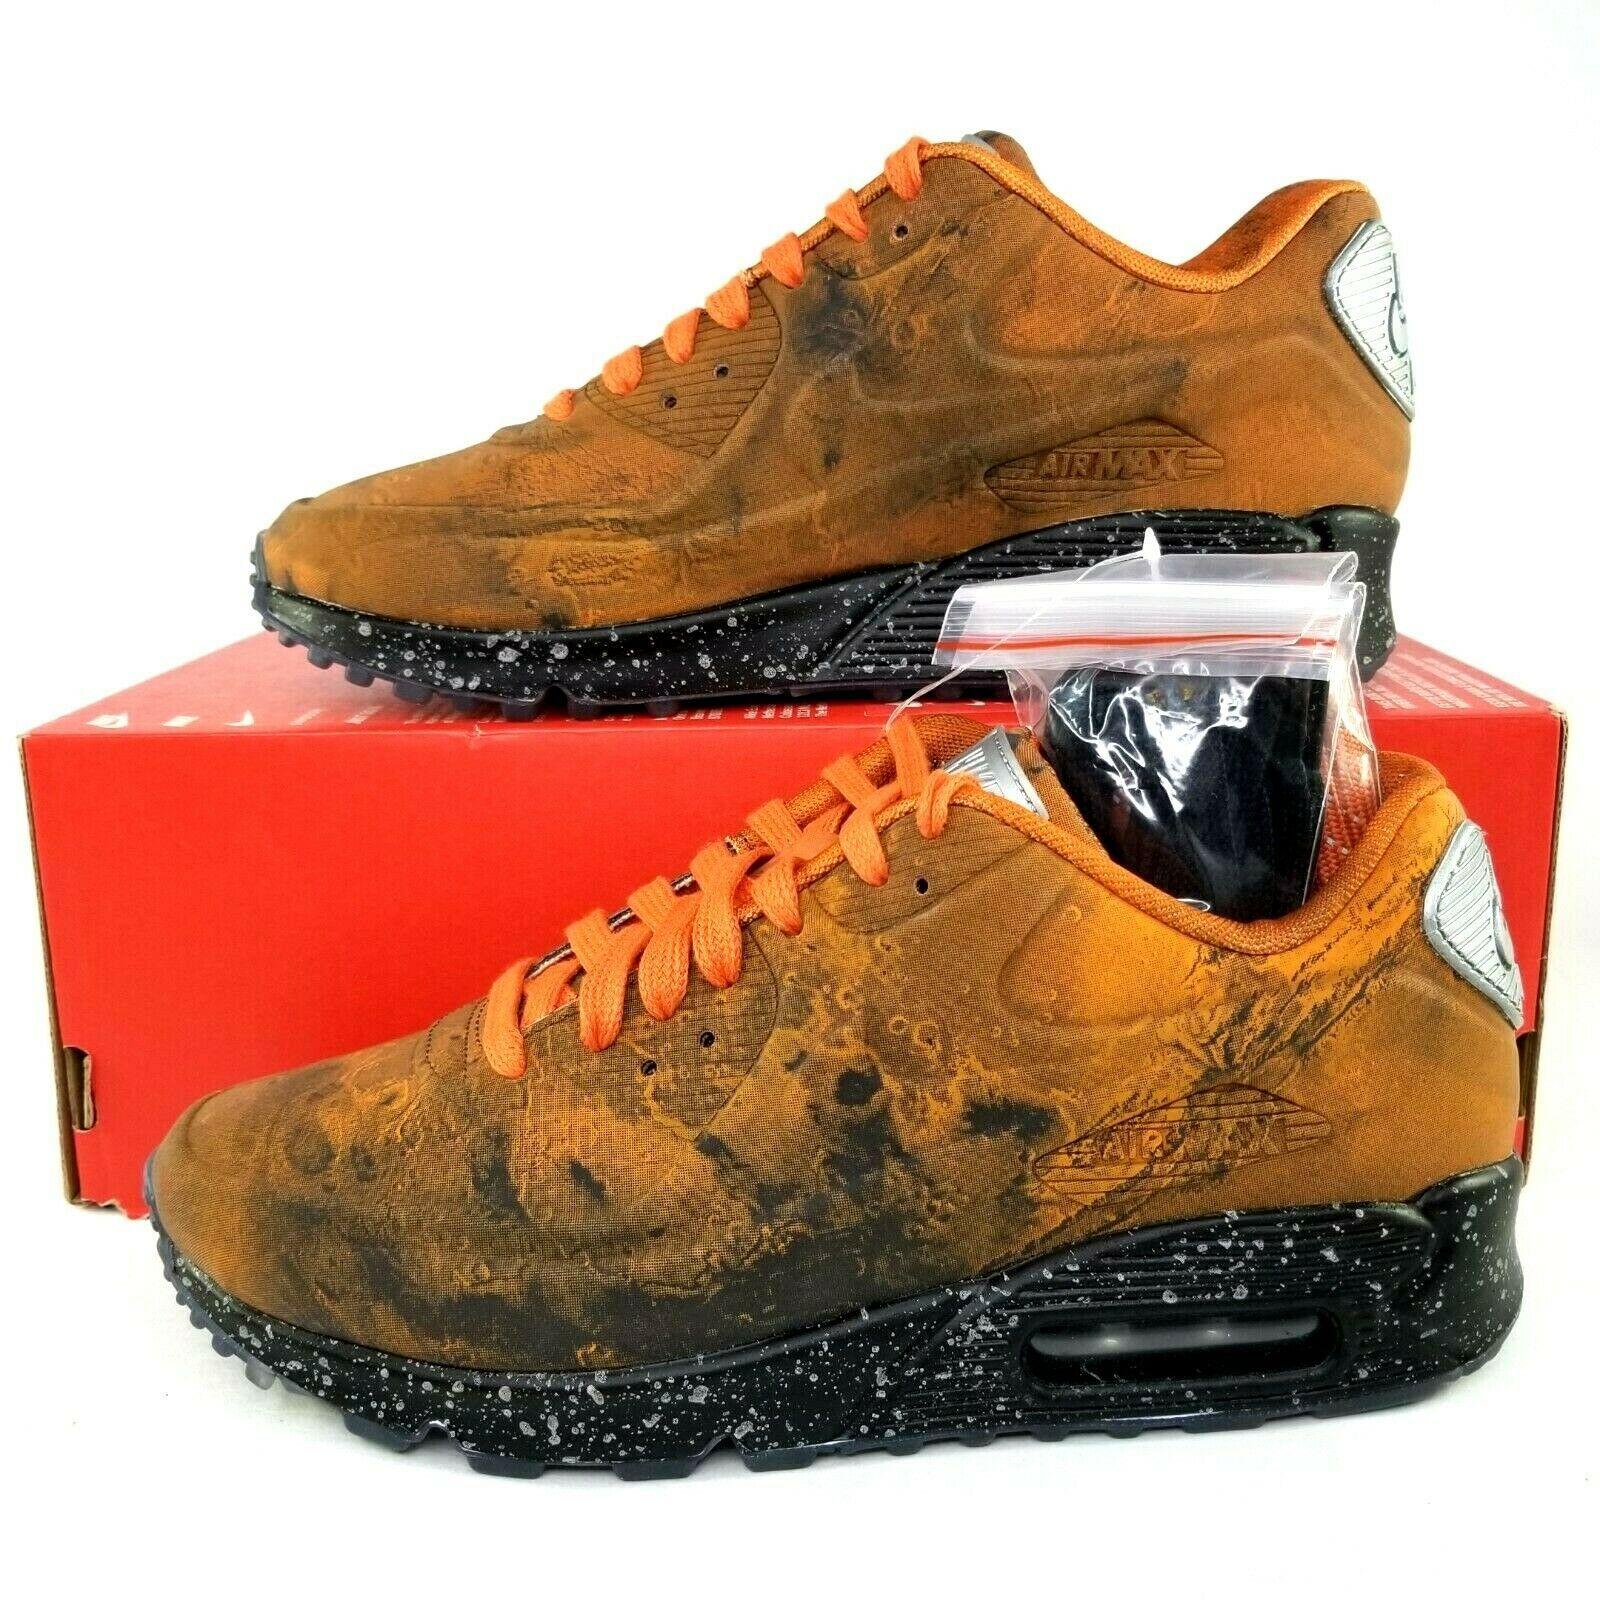 Nike Air Max 90 QS Mars Landing Shoes Mens Size 6 3M Reflective Orange Women 7.5